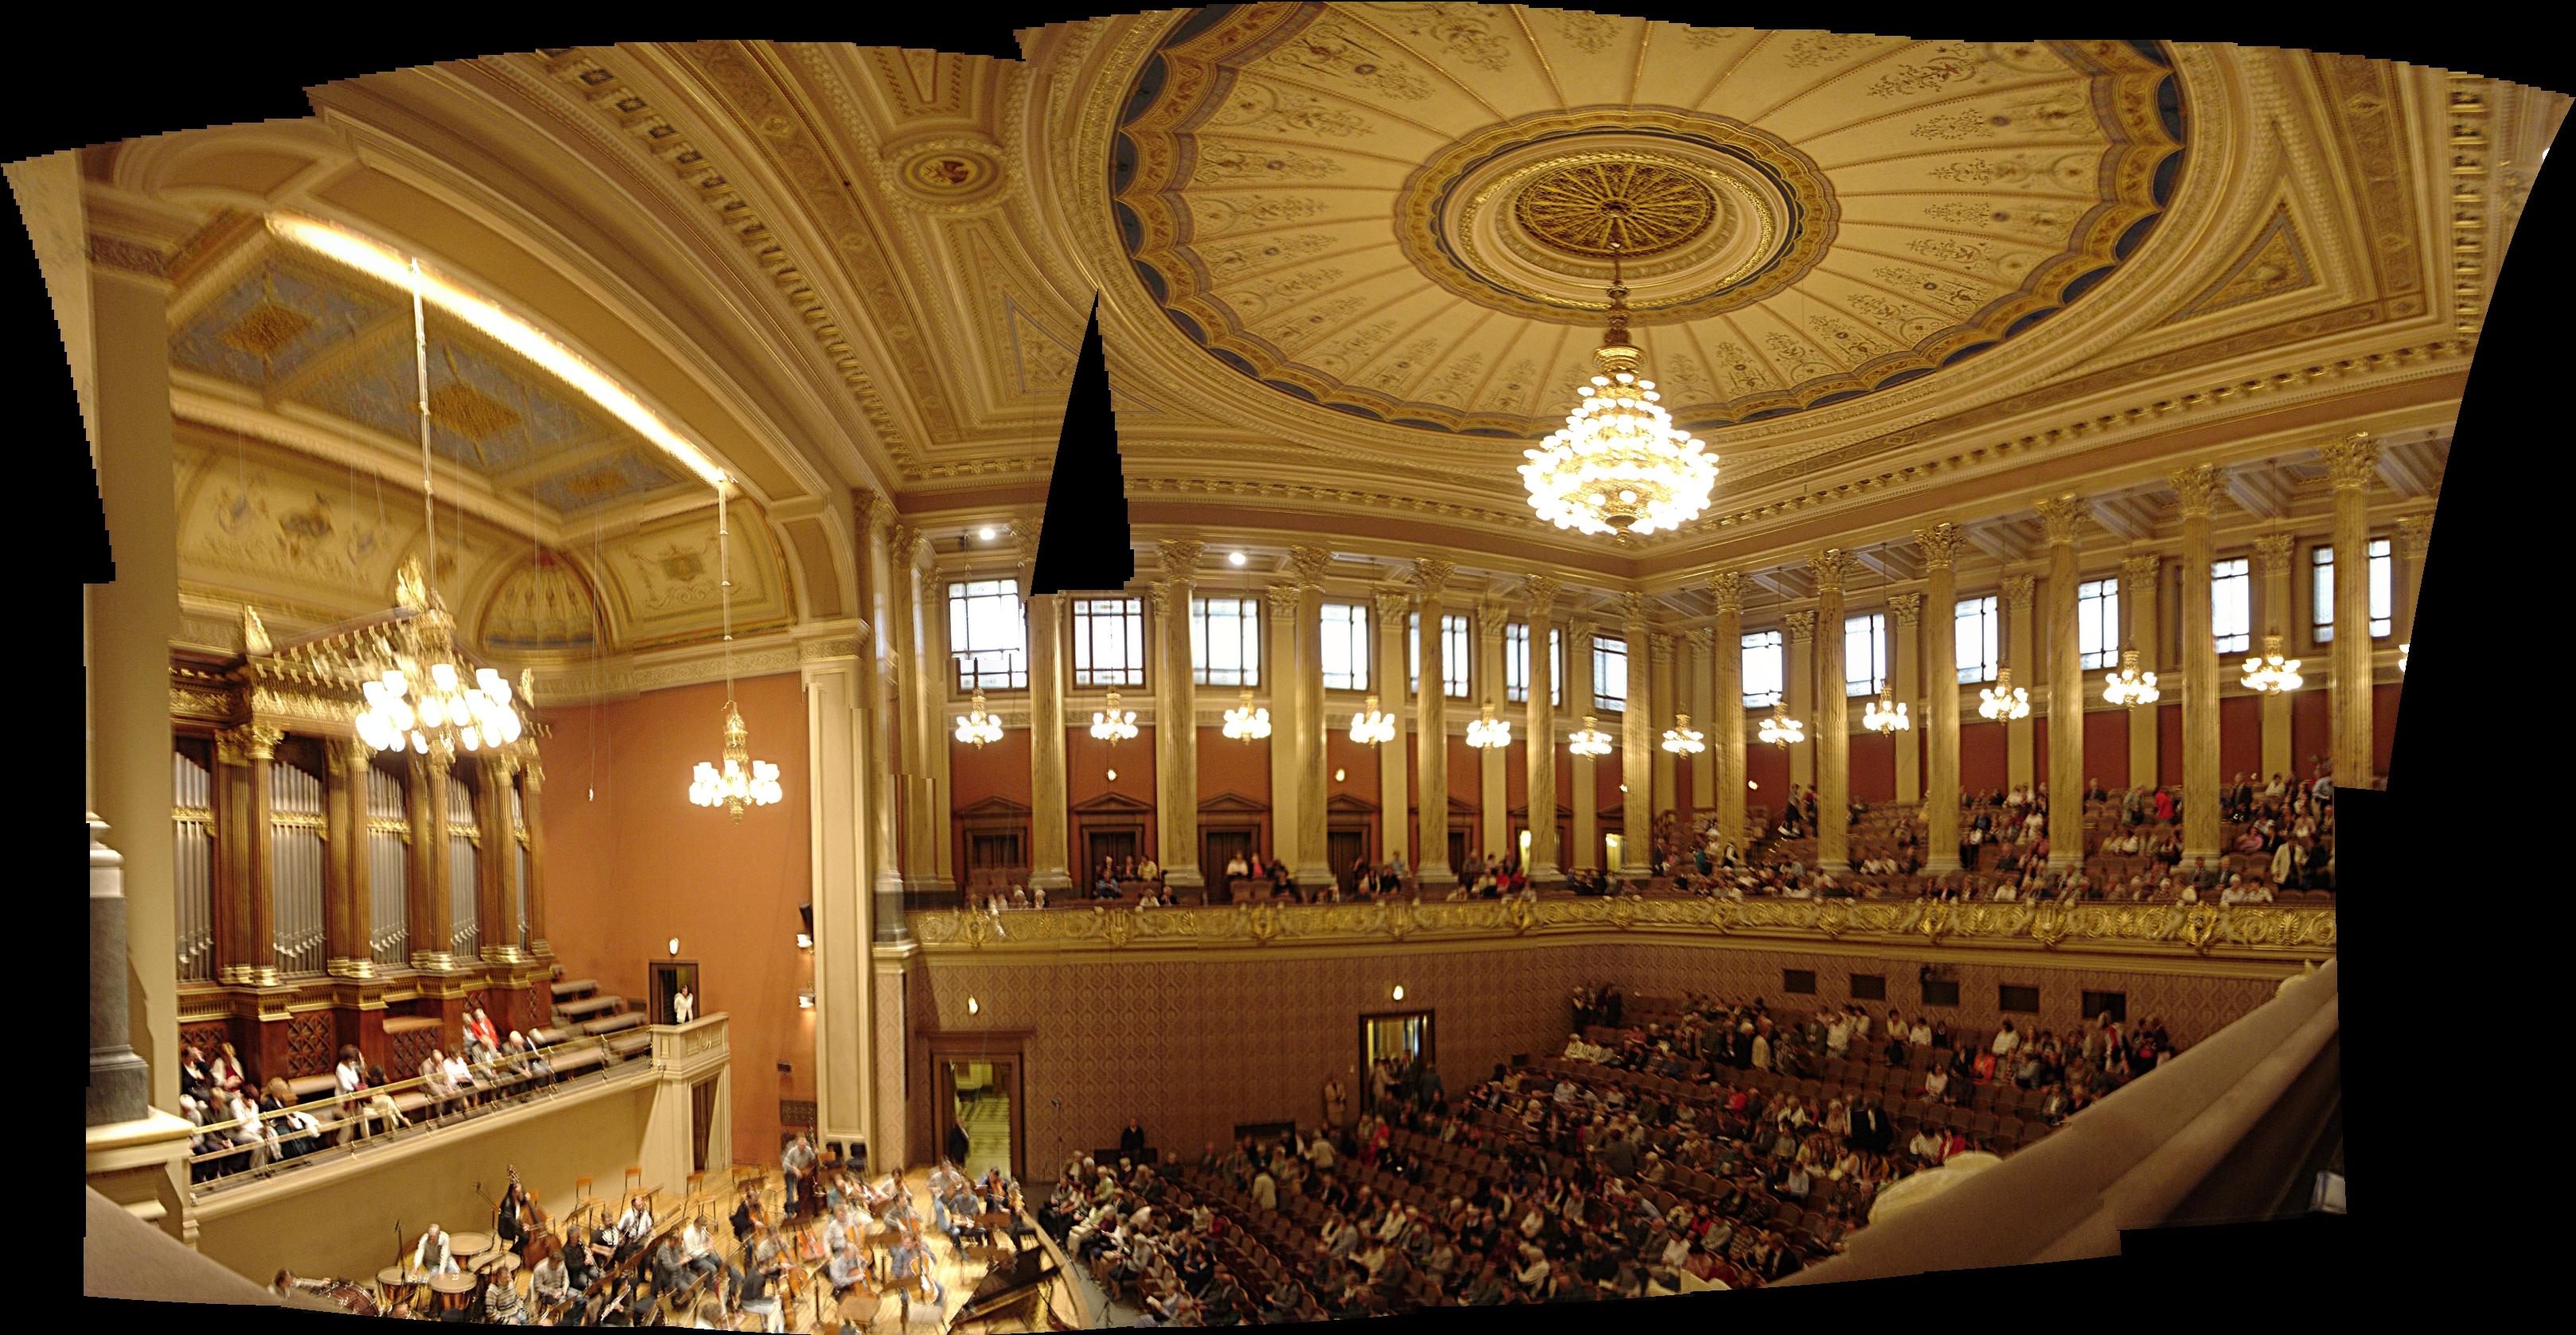 Praha - Rudolfinum Concert Hall - ICE Photocompilation IV.jpg